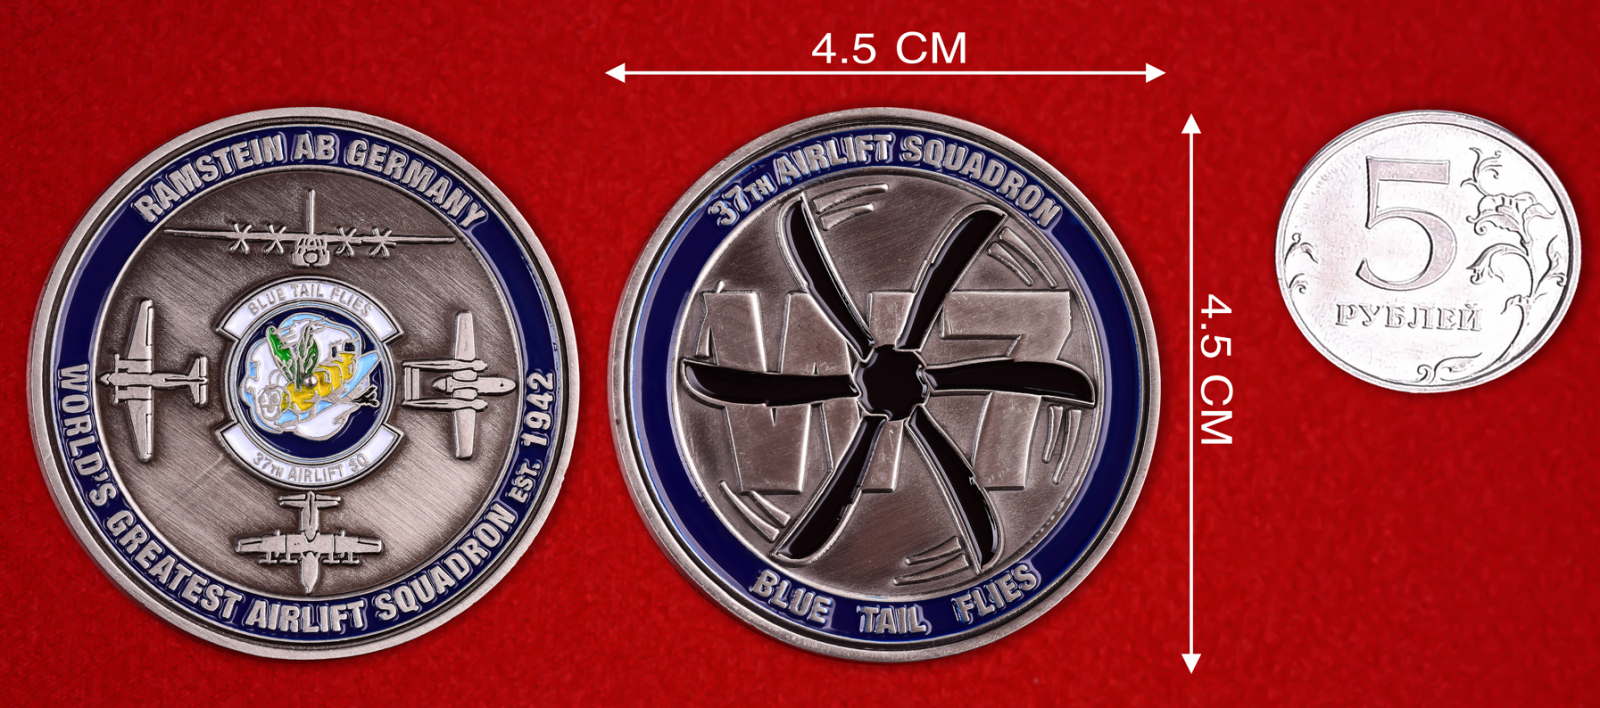 "Юбилейный знак ВВС США ""База Рамштайн. 37-я эскадрилья"""